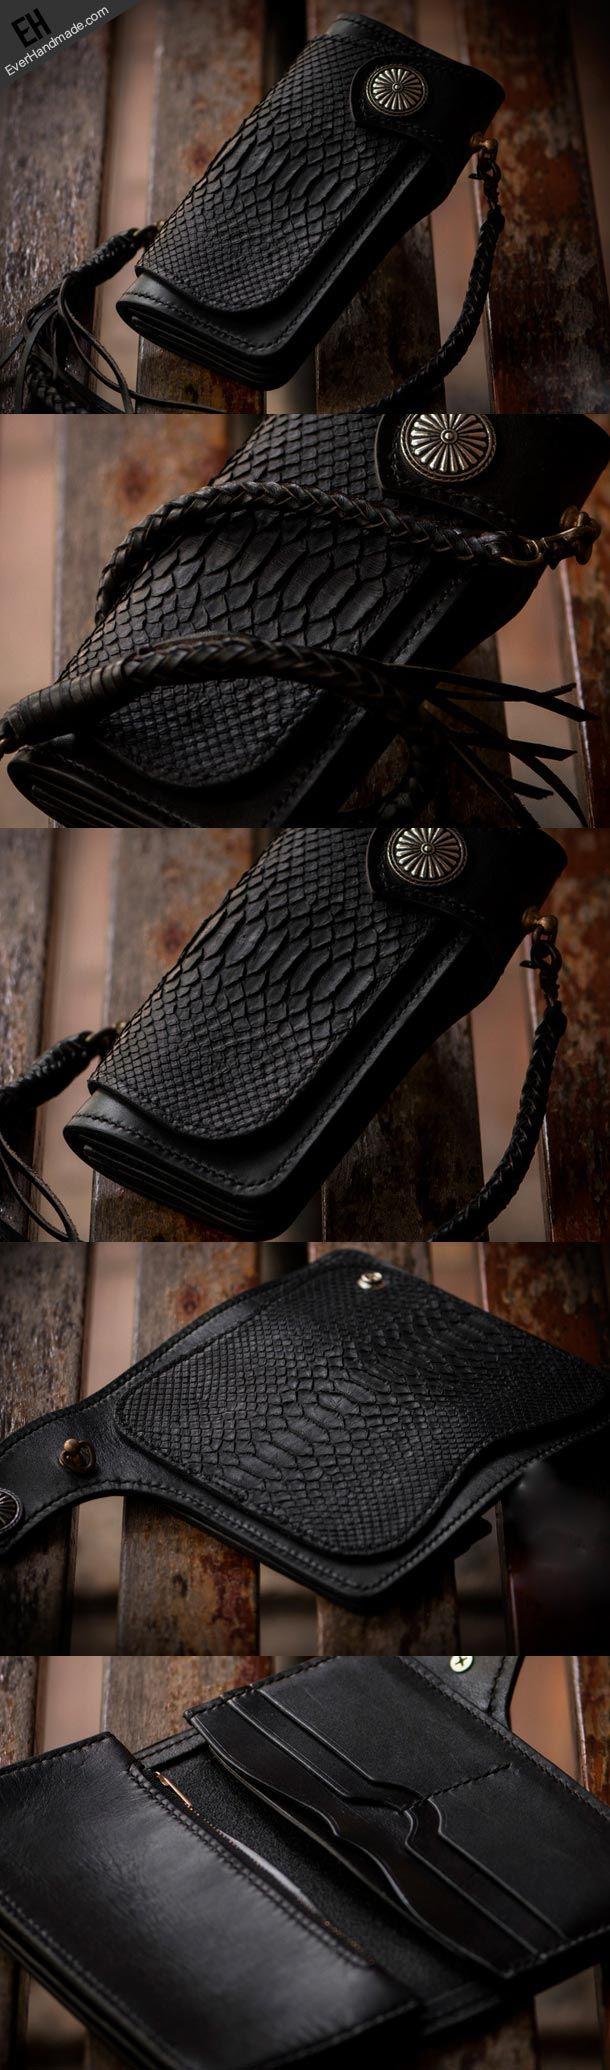 Handmade leather biker chain trucker wallet leather men Black snake skin Tooled wallet